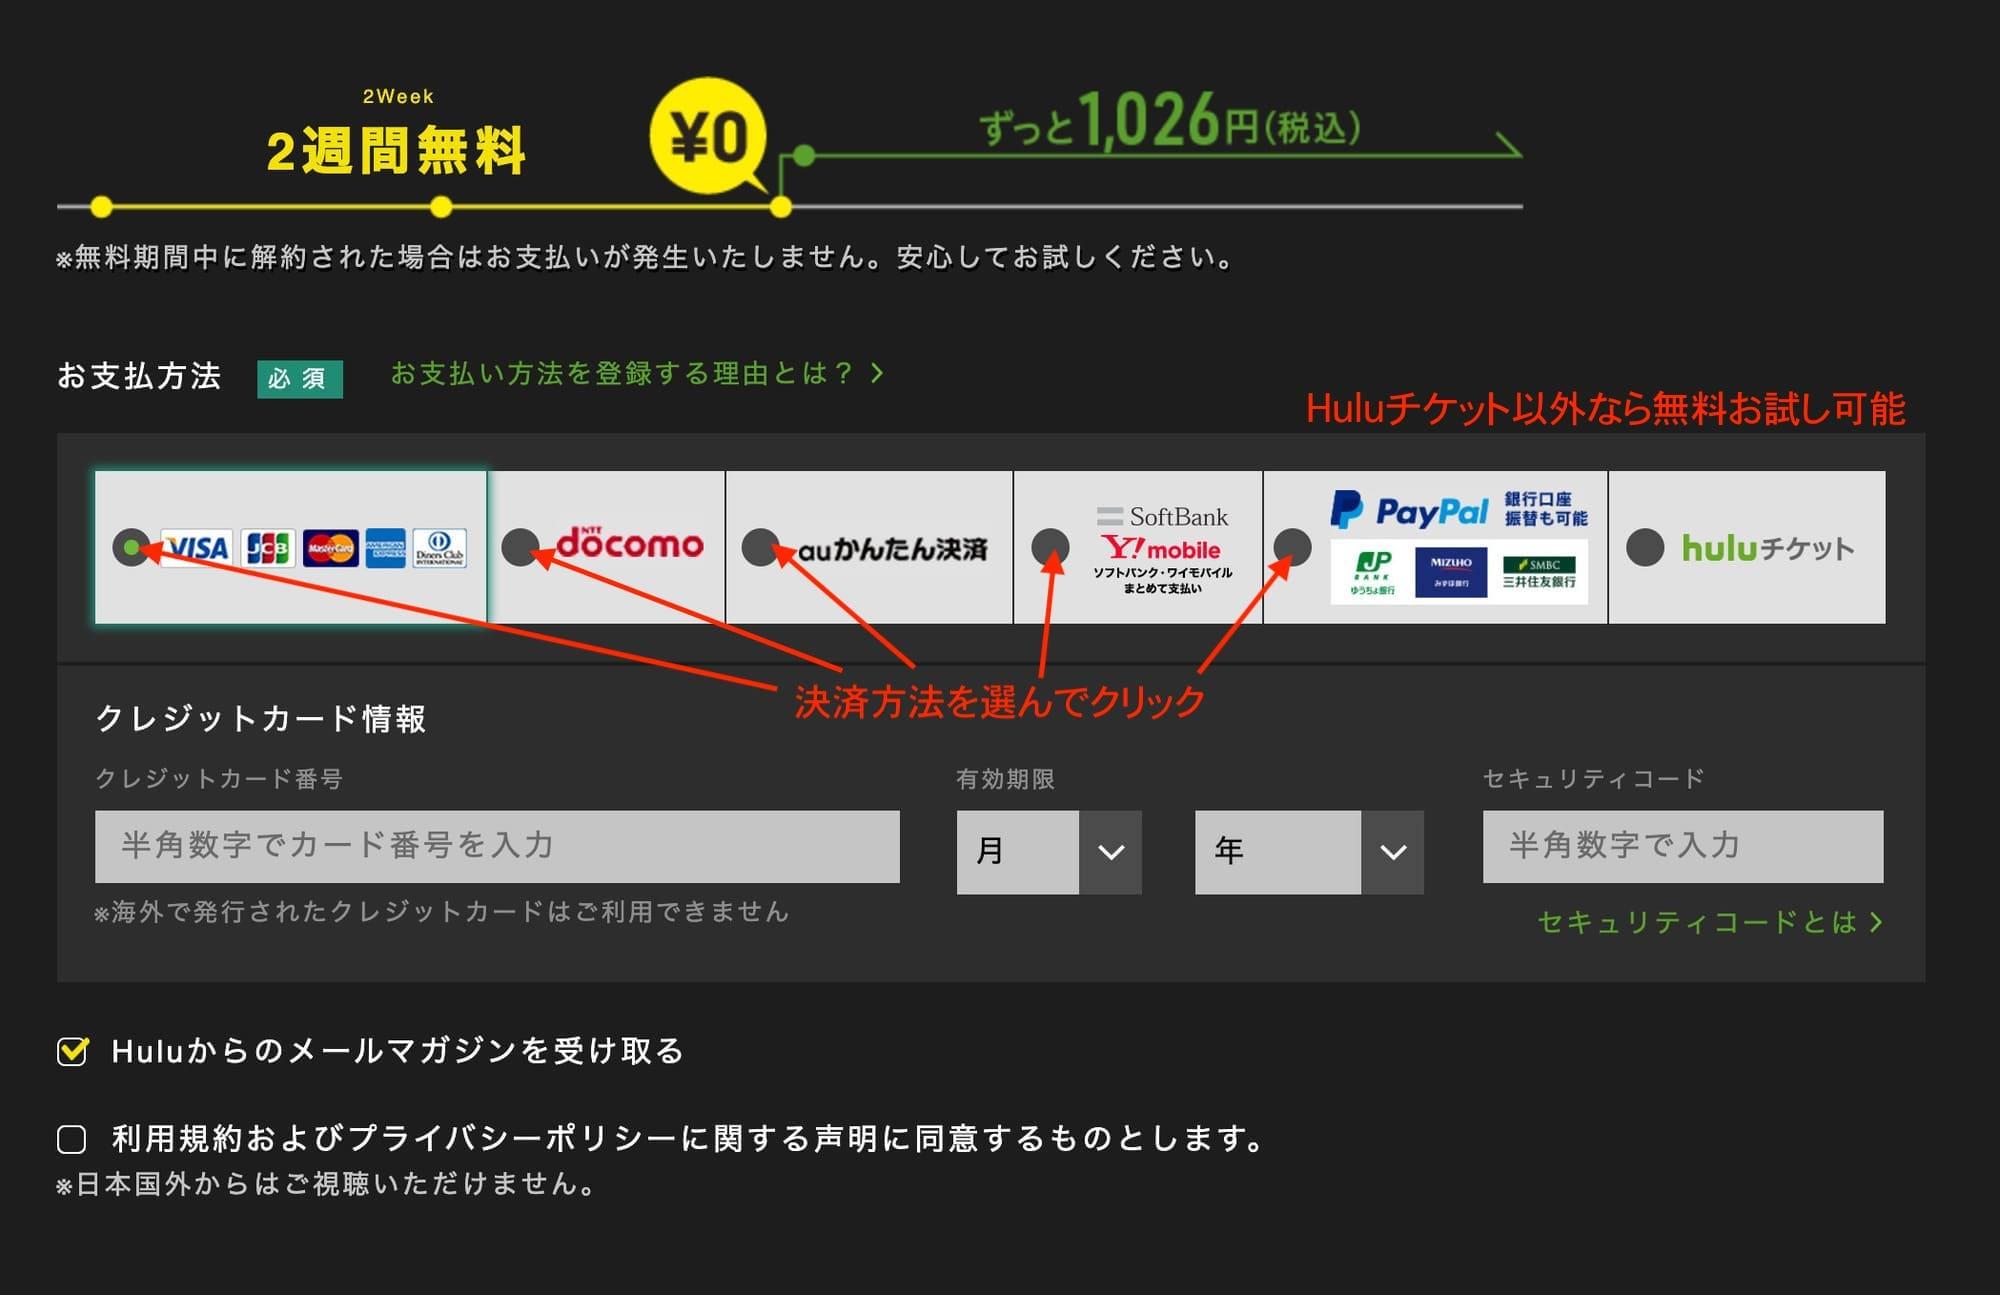 Huluの支払い方法選択画面